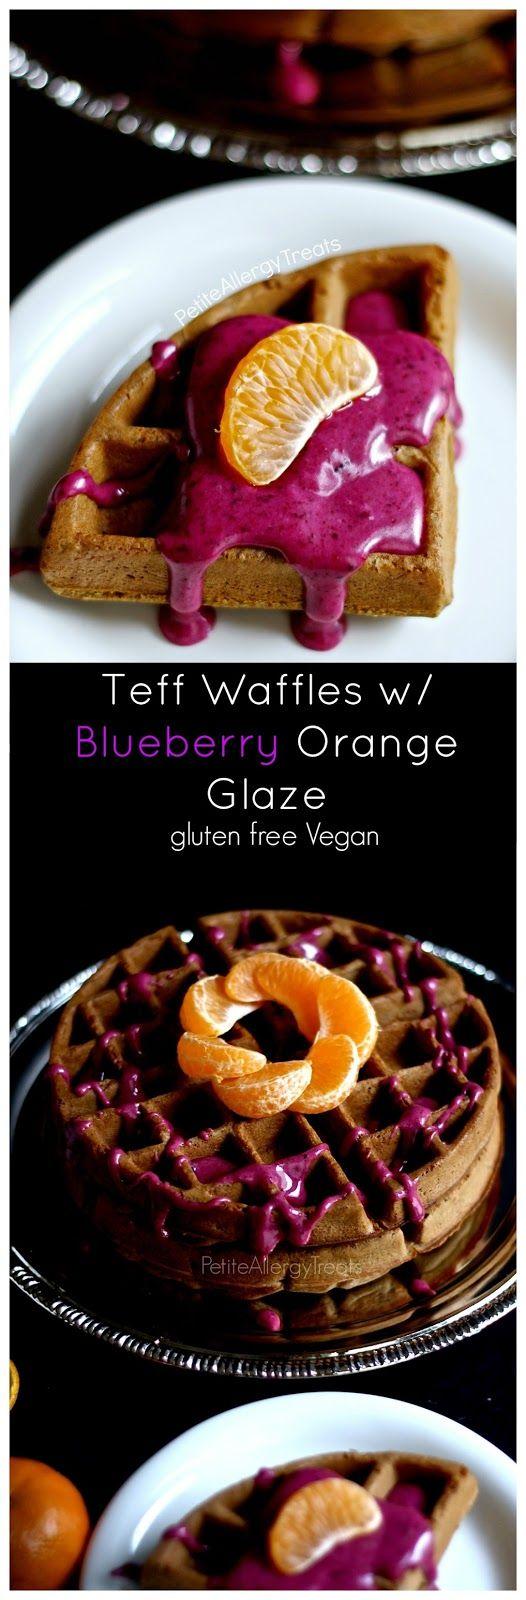 Teff Waffles w/ Blueberry Orange Glaze (gluten free vegan) Delicious waffles packed with wholesome teff flour and blueberry-orange glaze